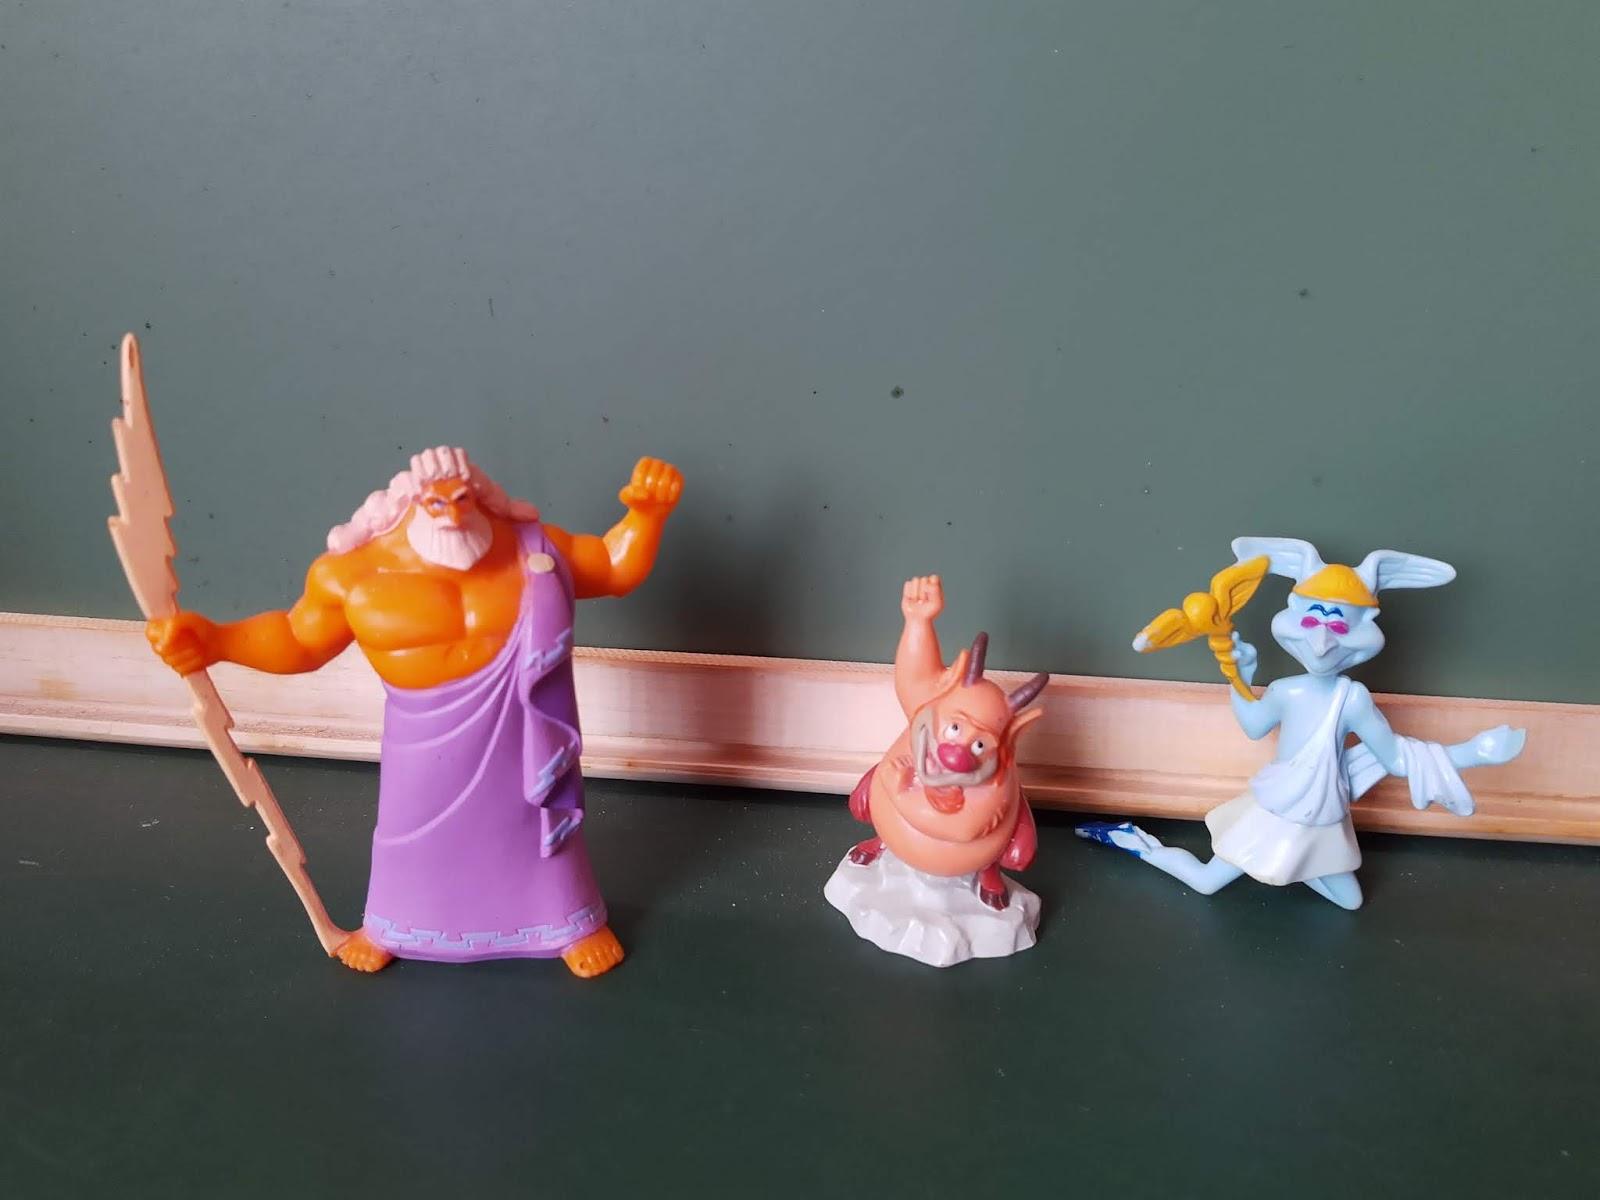 Taffy Shop Brecho De Brinquedos Miniaturas De Vinil Estatica